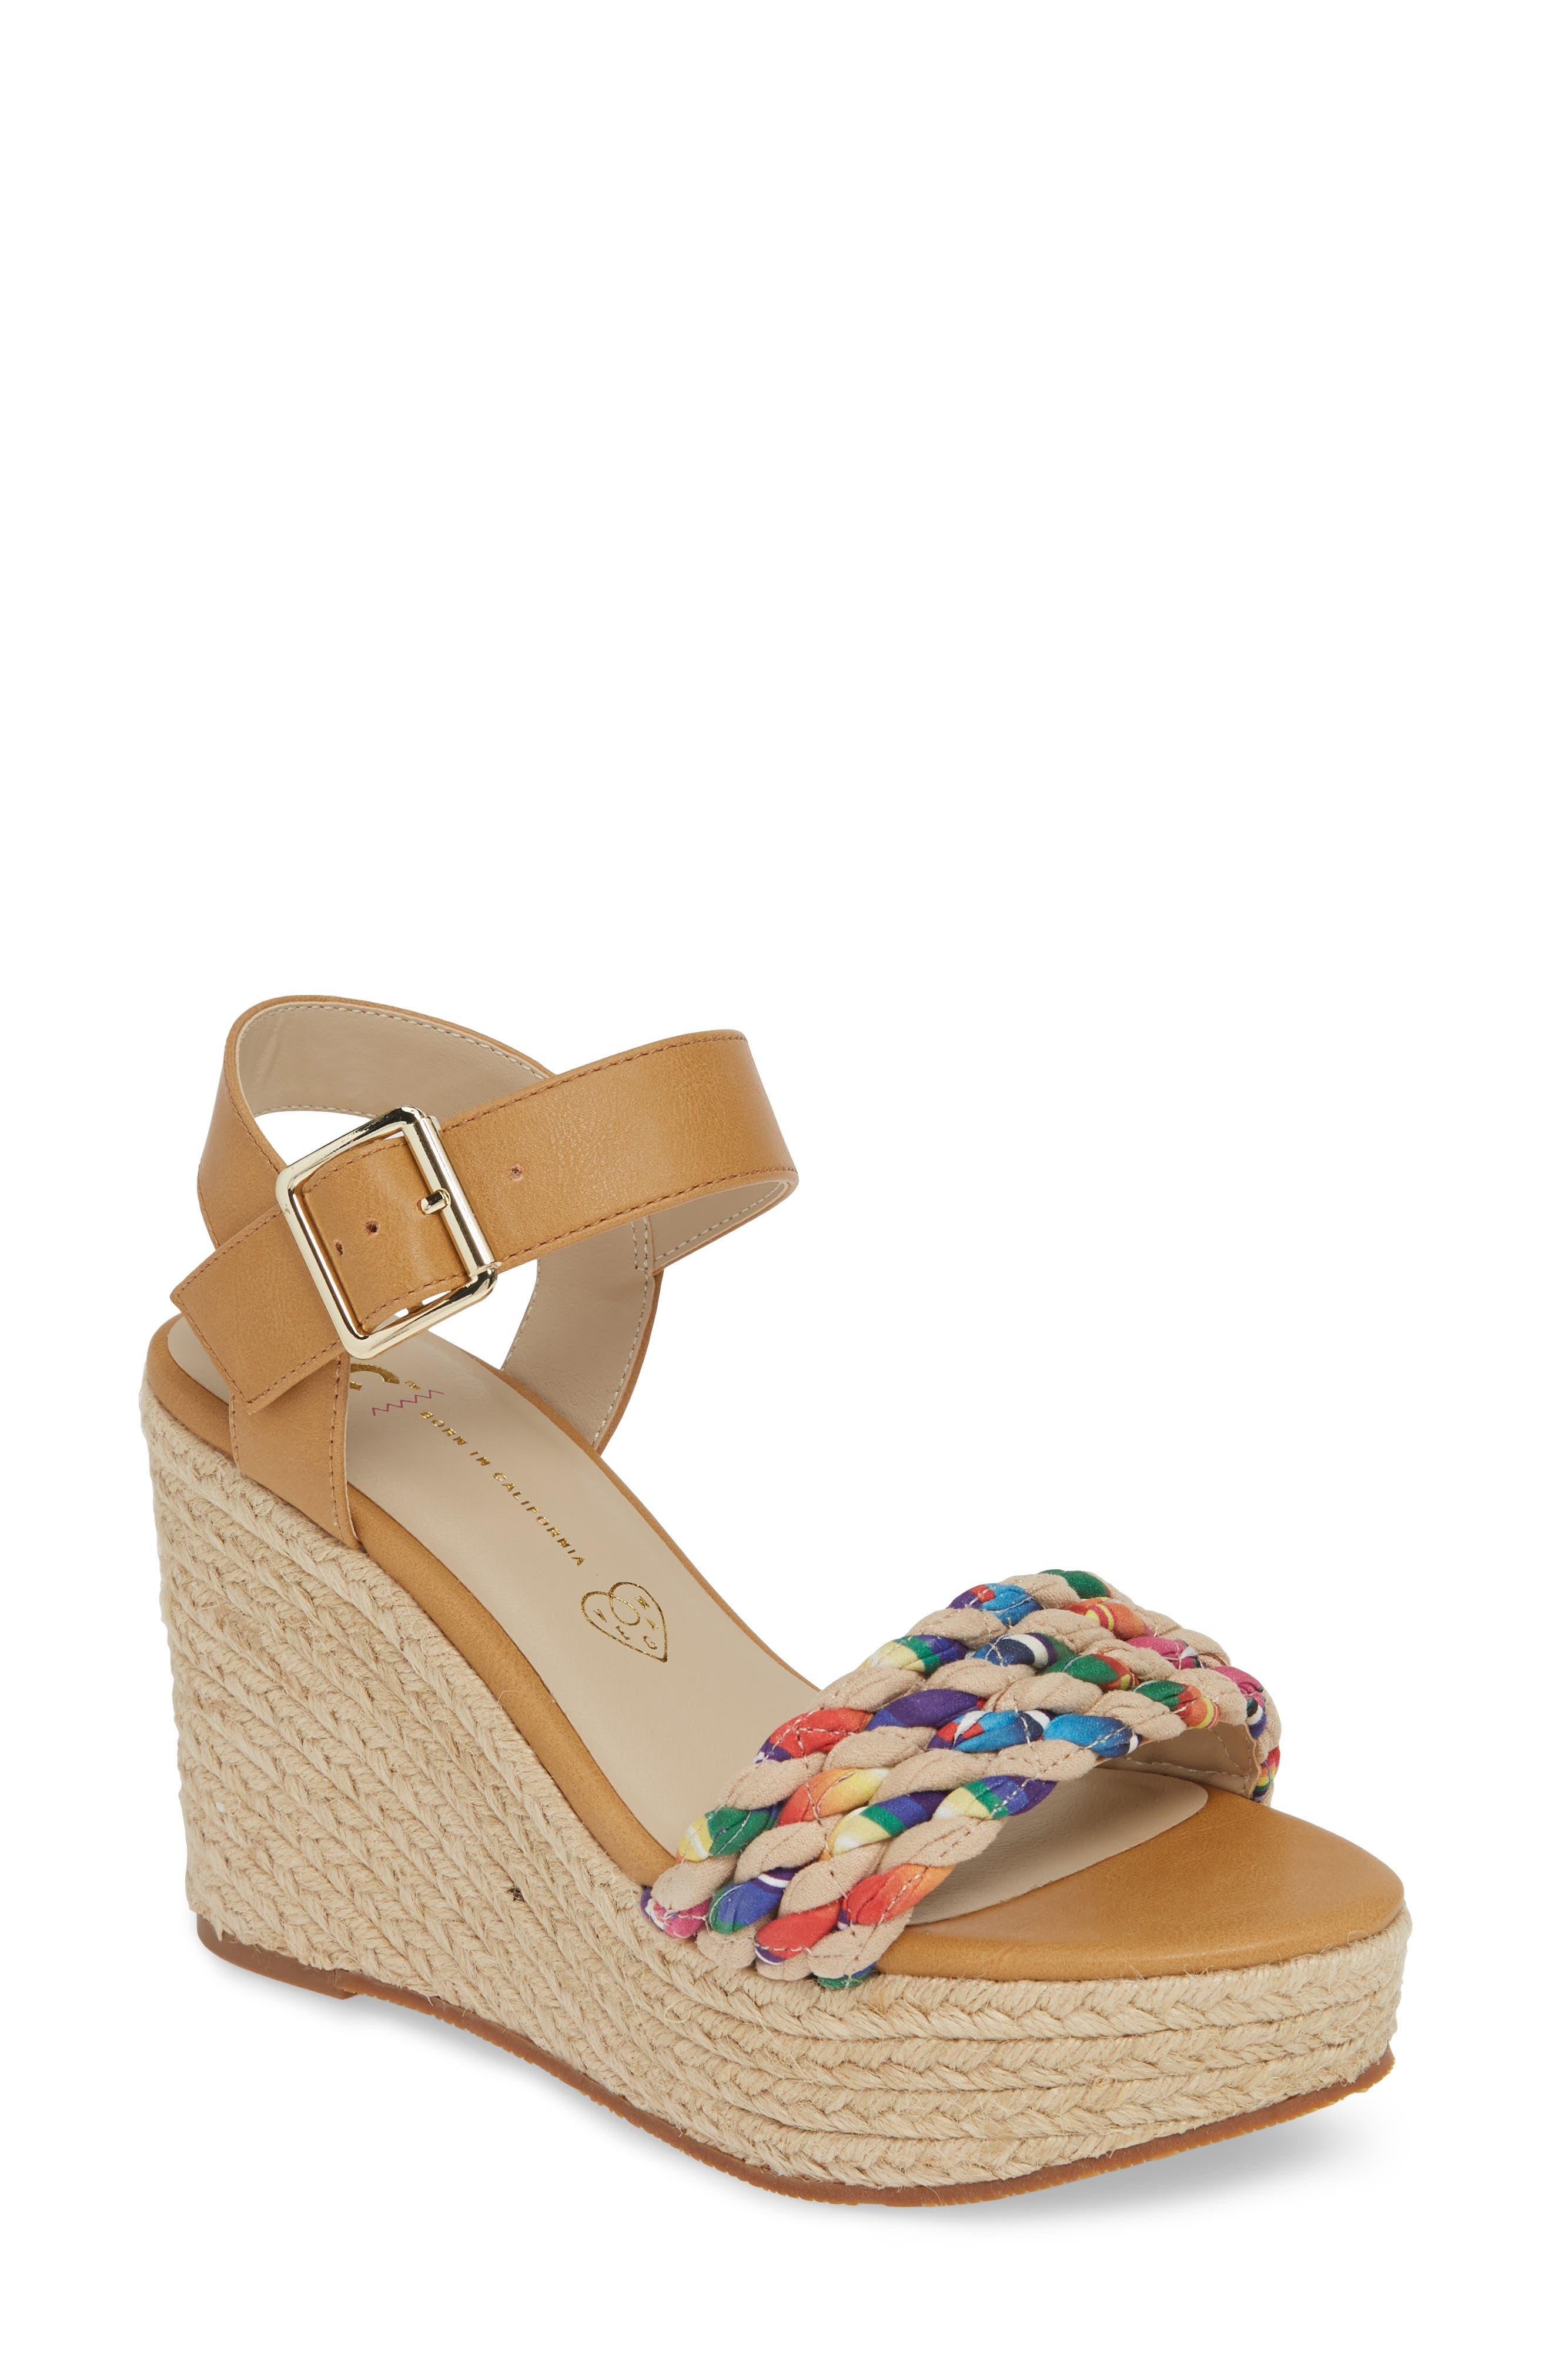 2629a9c0cf17 Bc Footwear Dew Drops Vegan Espadrille Wedge Sandal- Brown